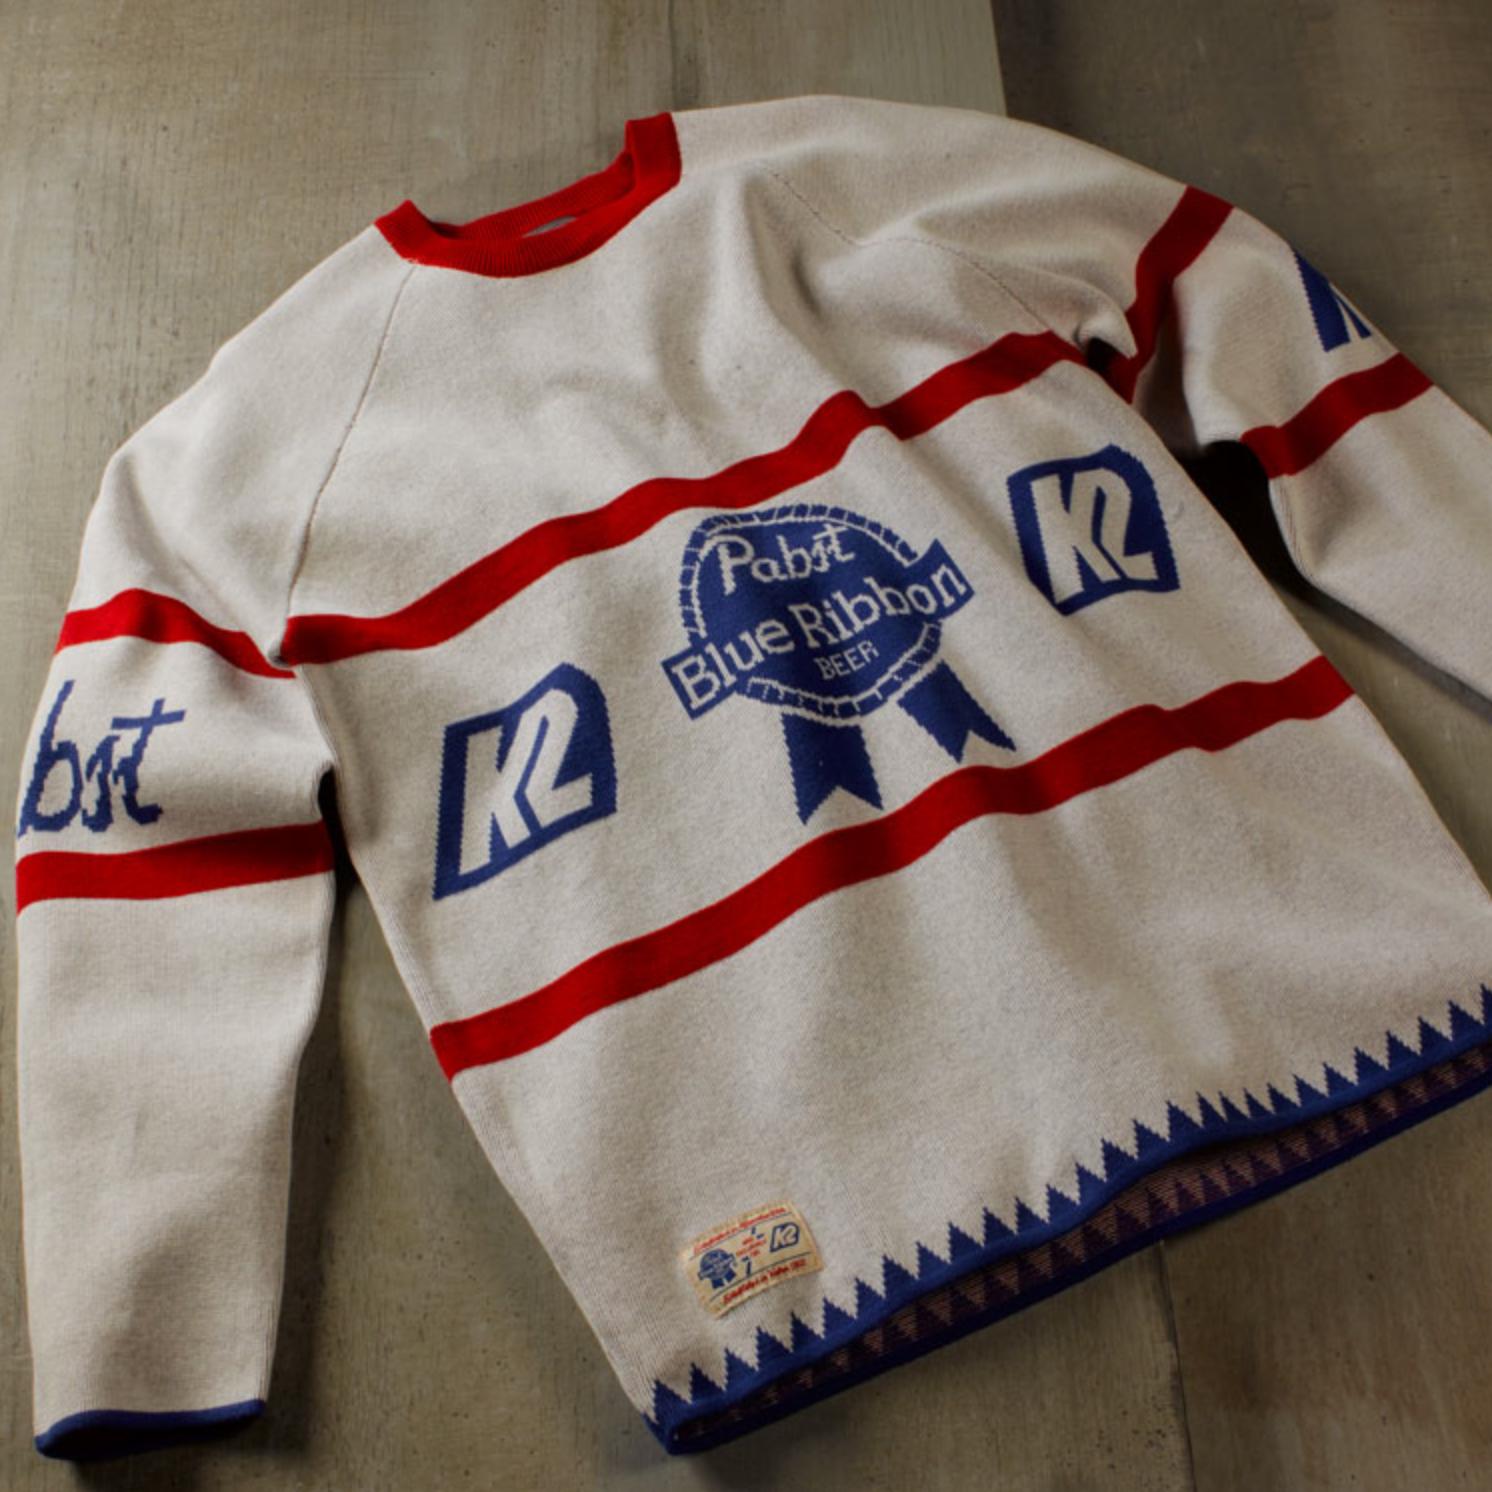 K2 Sweater